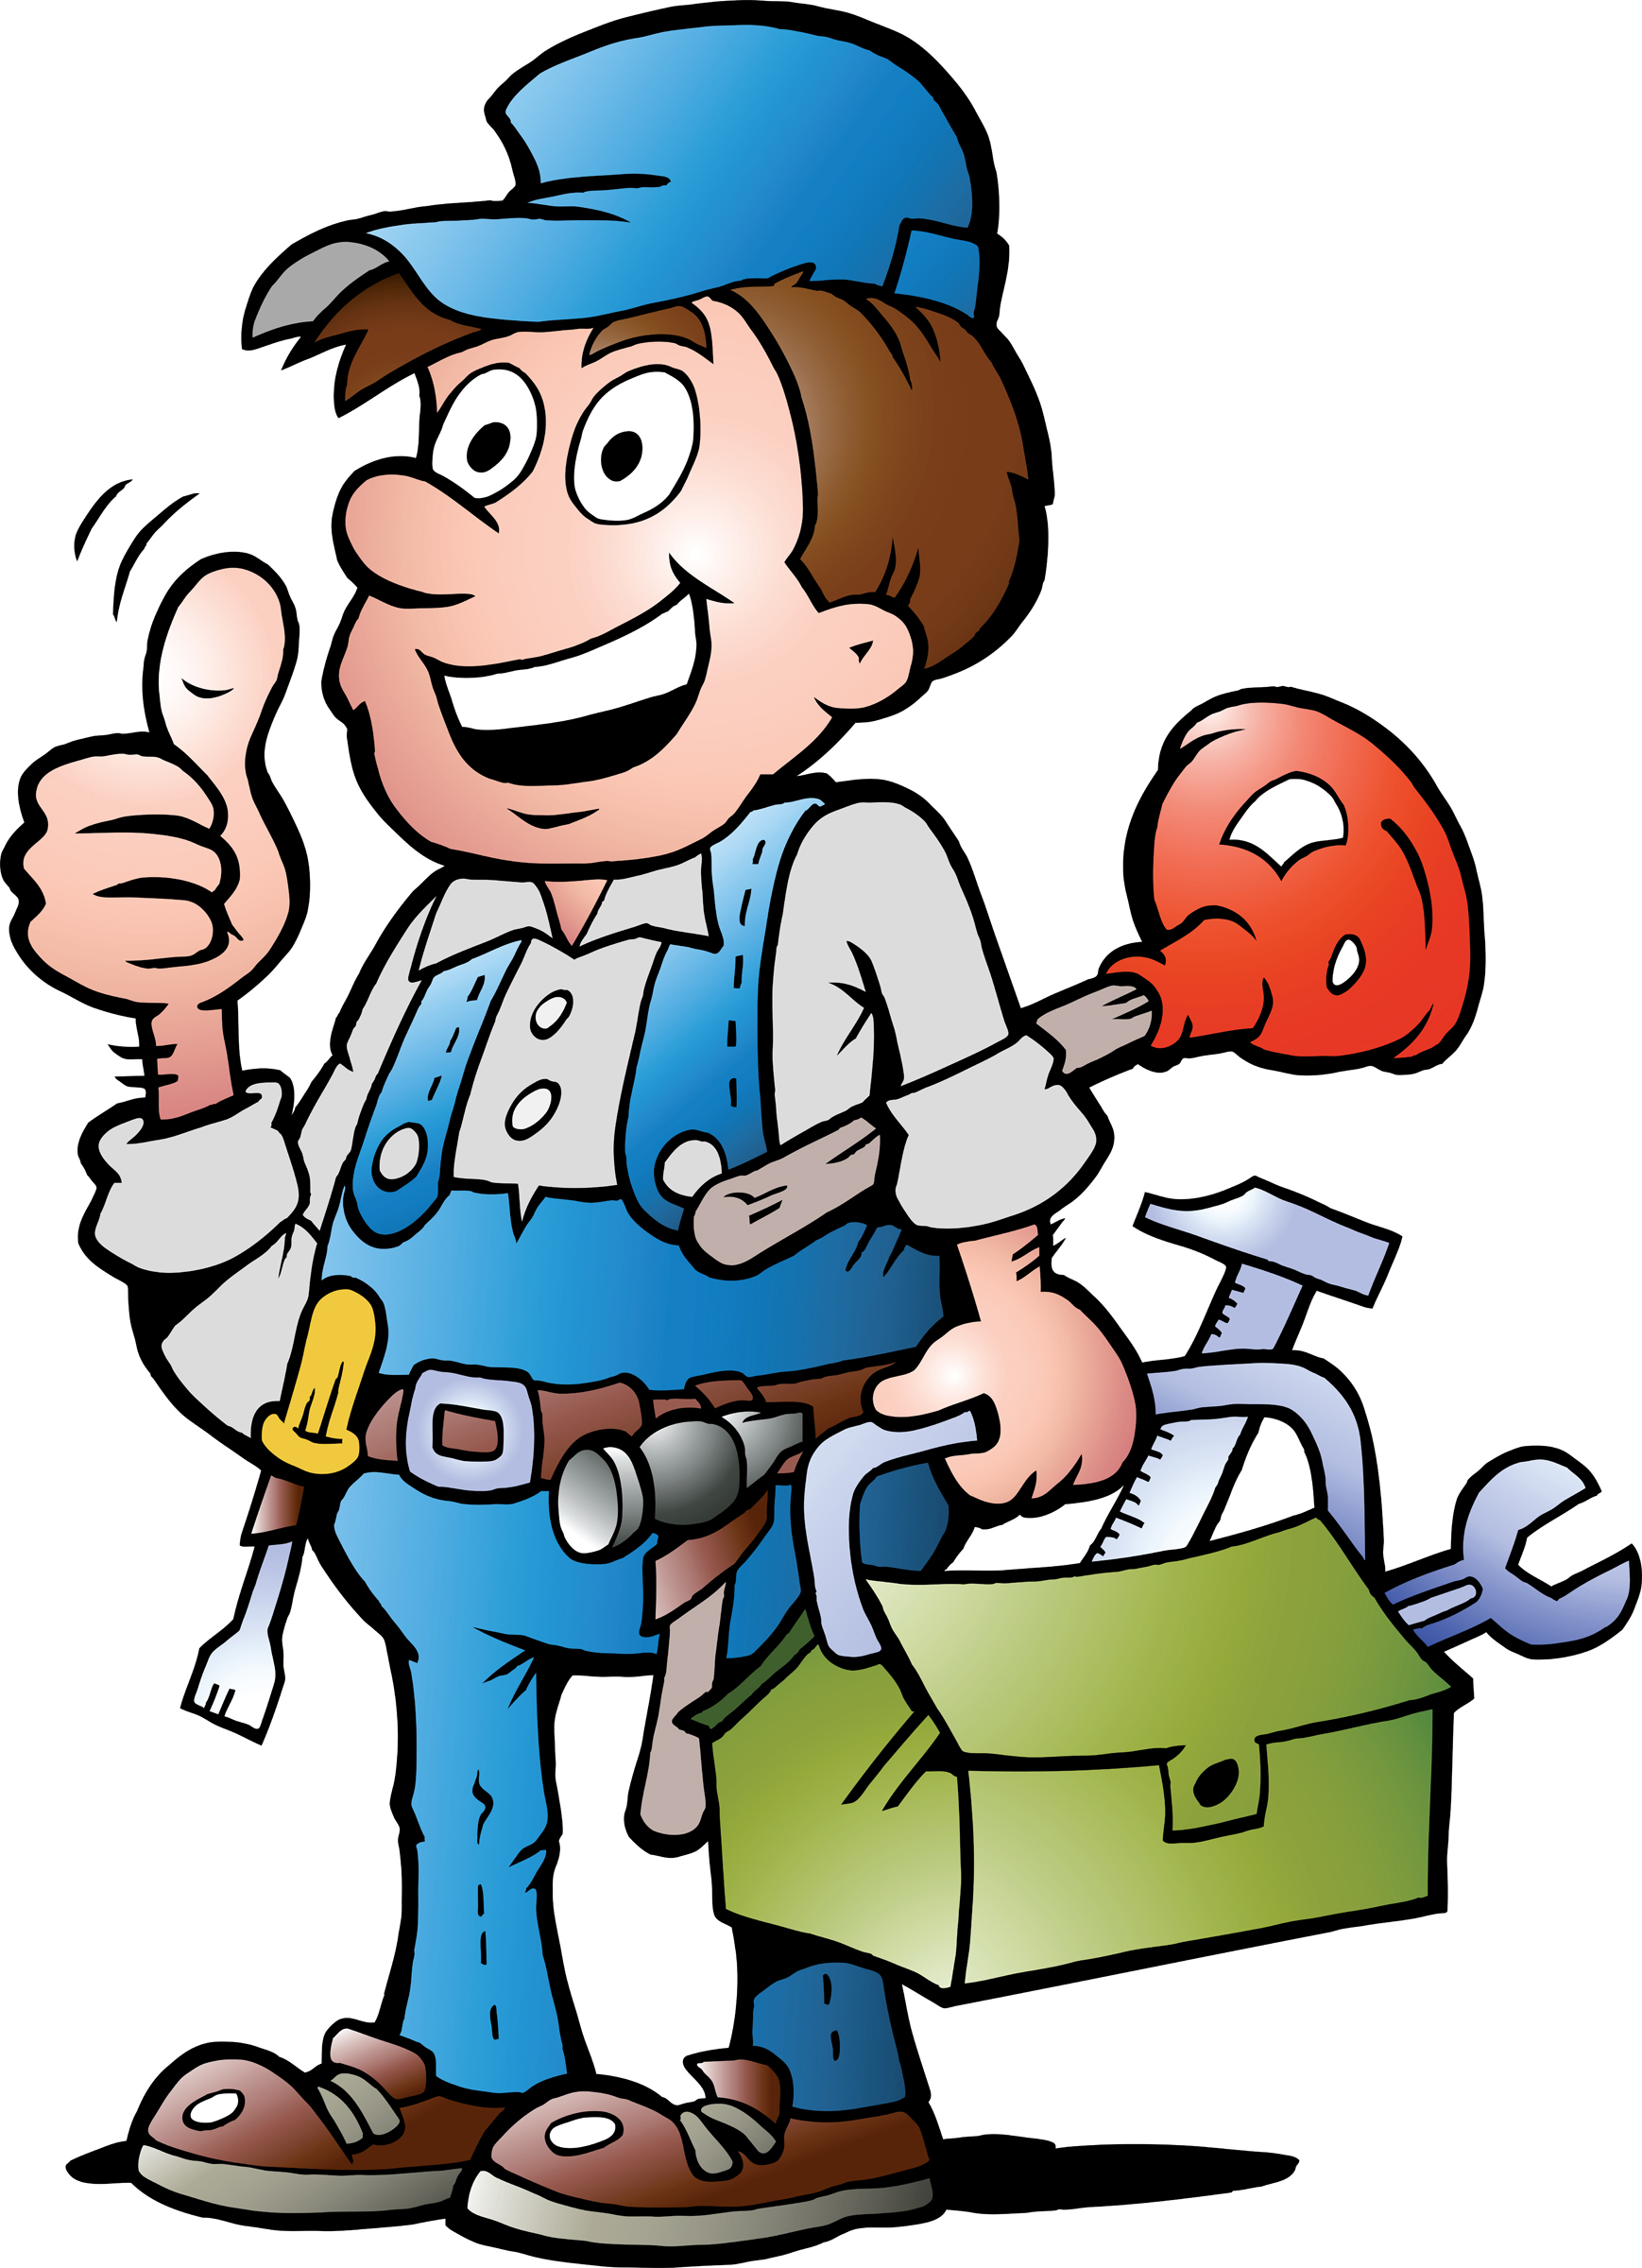 Gardener clipart handyman. Free cliparts download clip